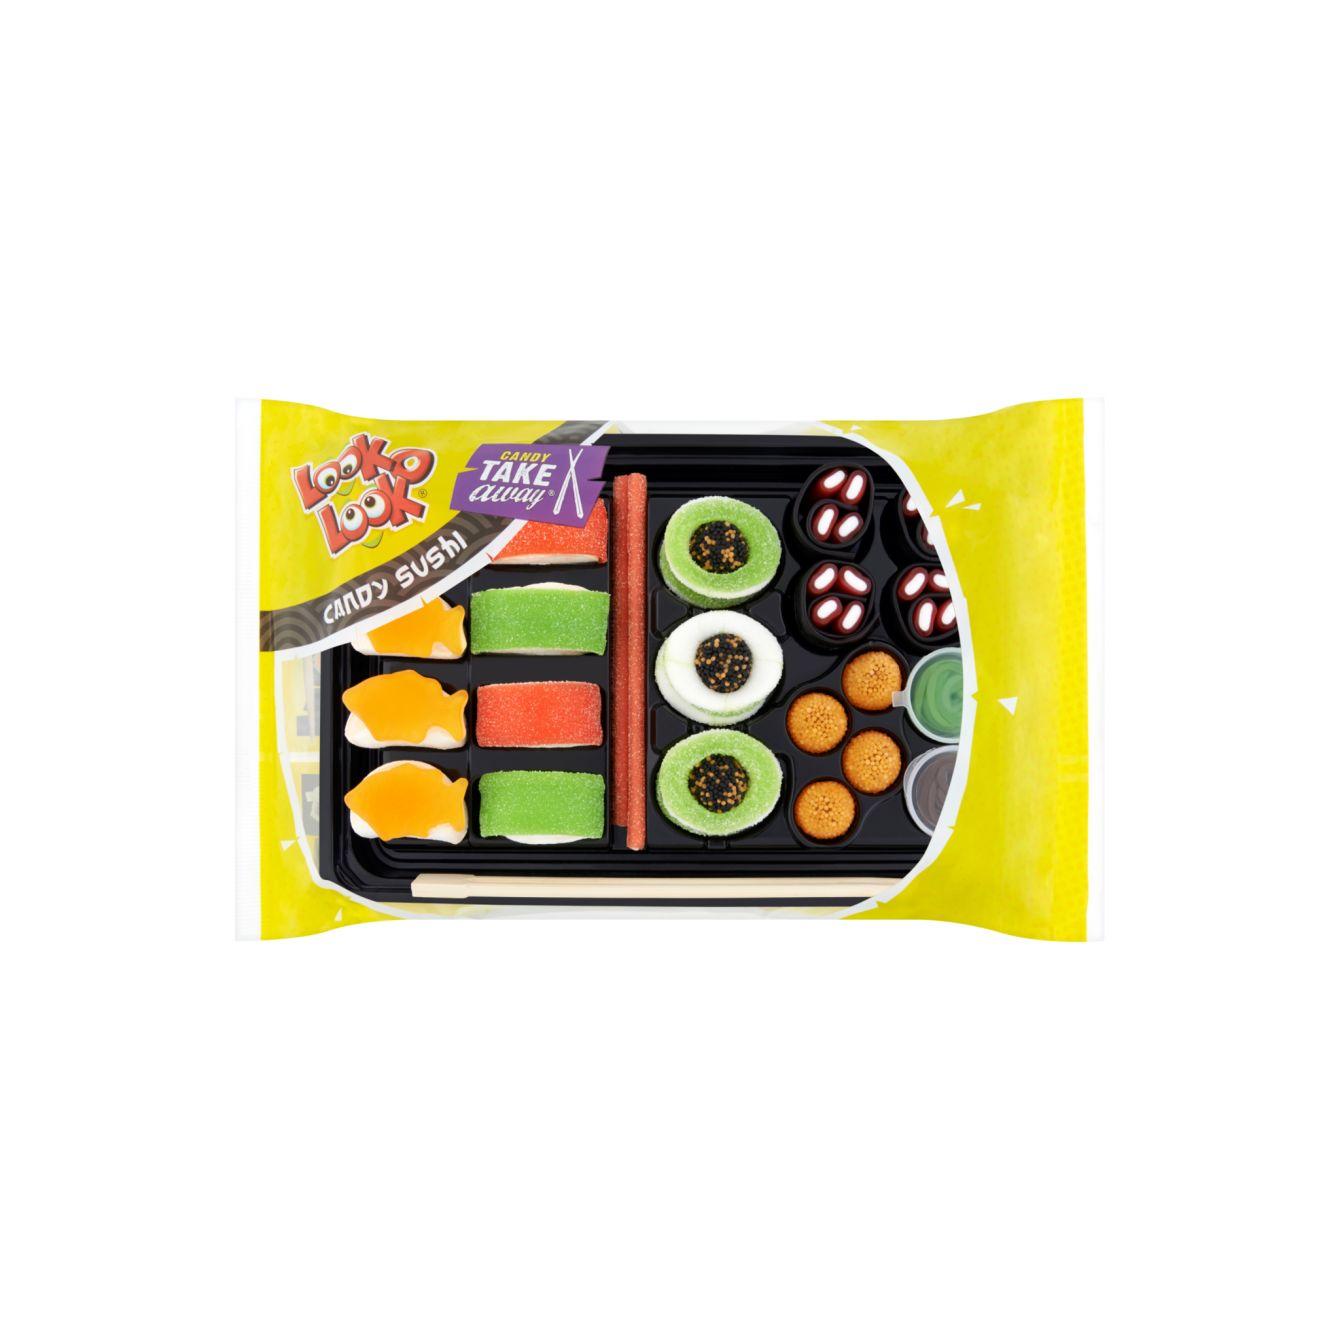 Look-o-look Candy Sushi